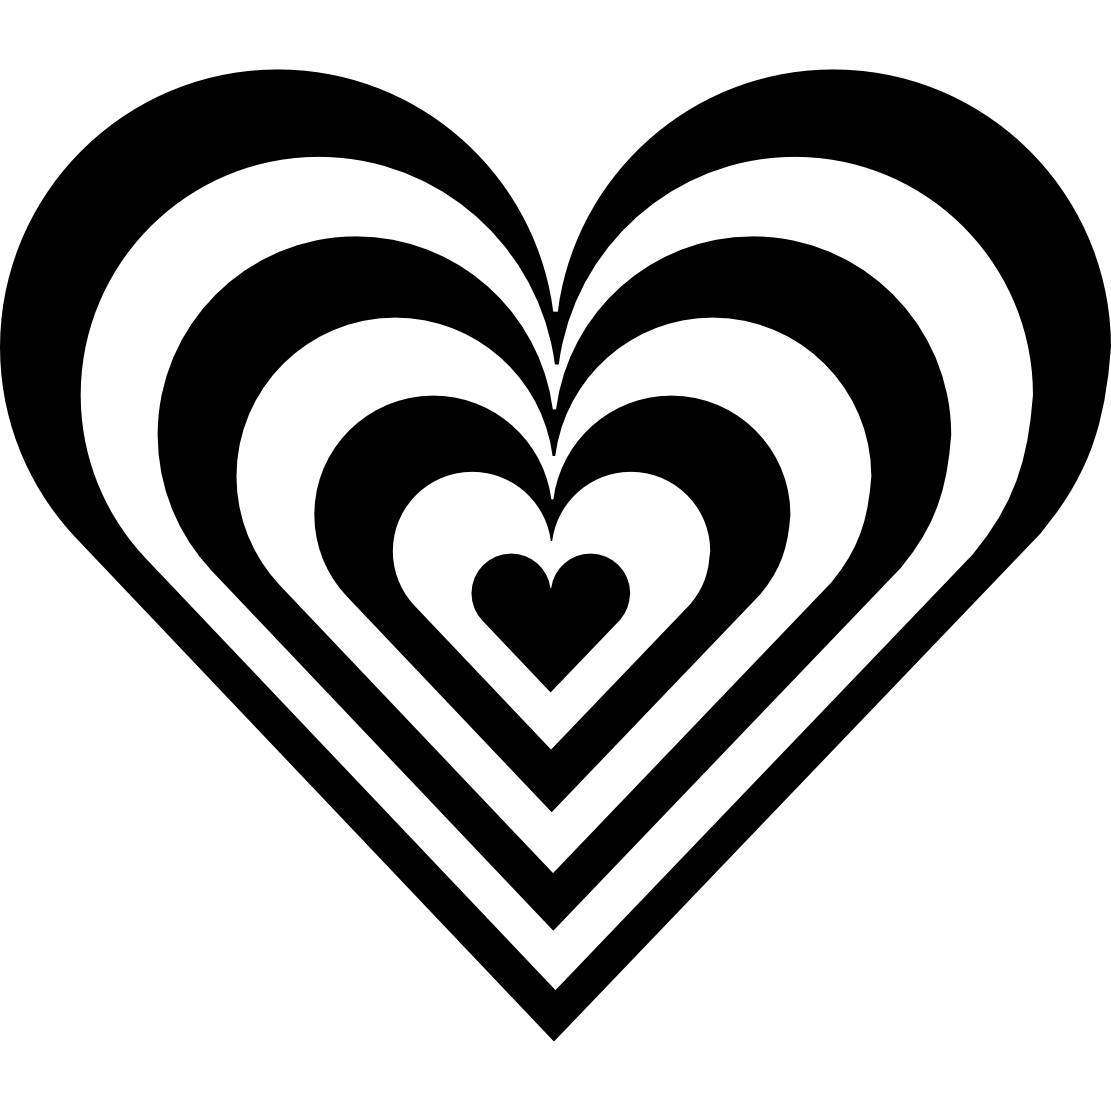 heart border clipart black and white